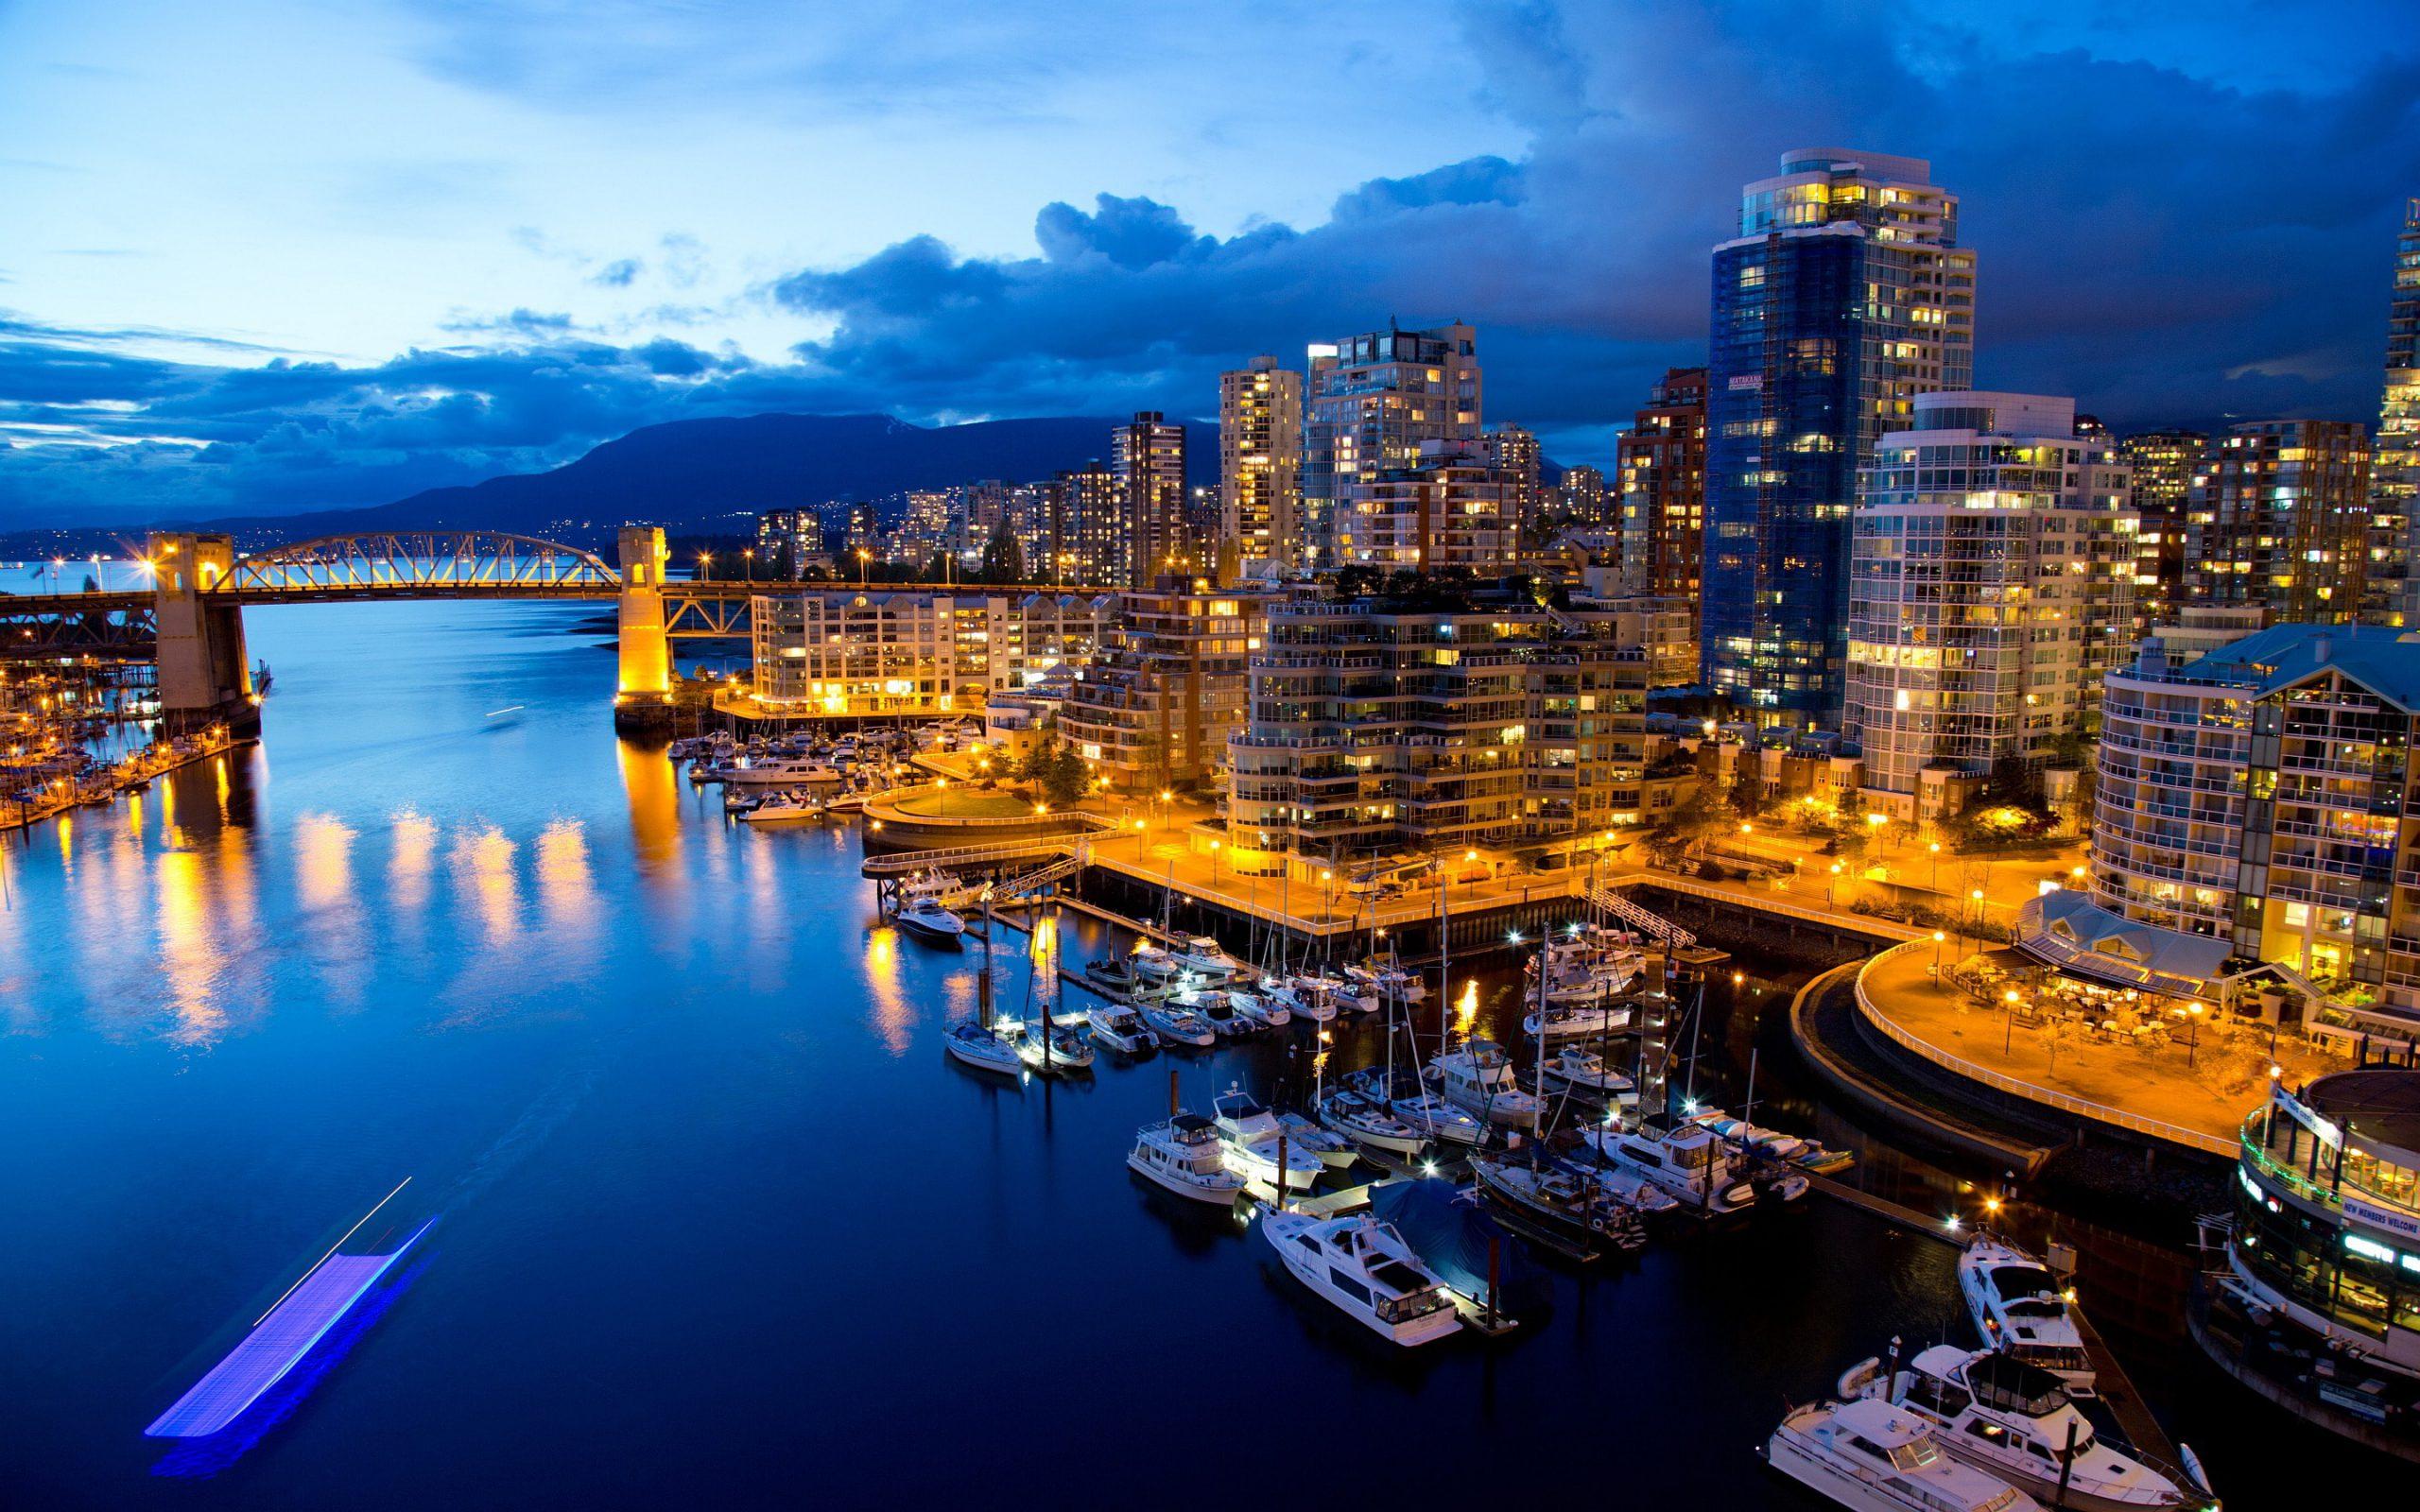 HD Vancouver Wallpaper